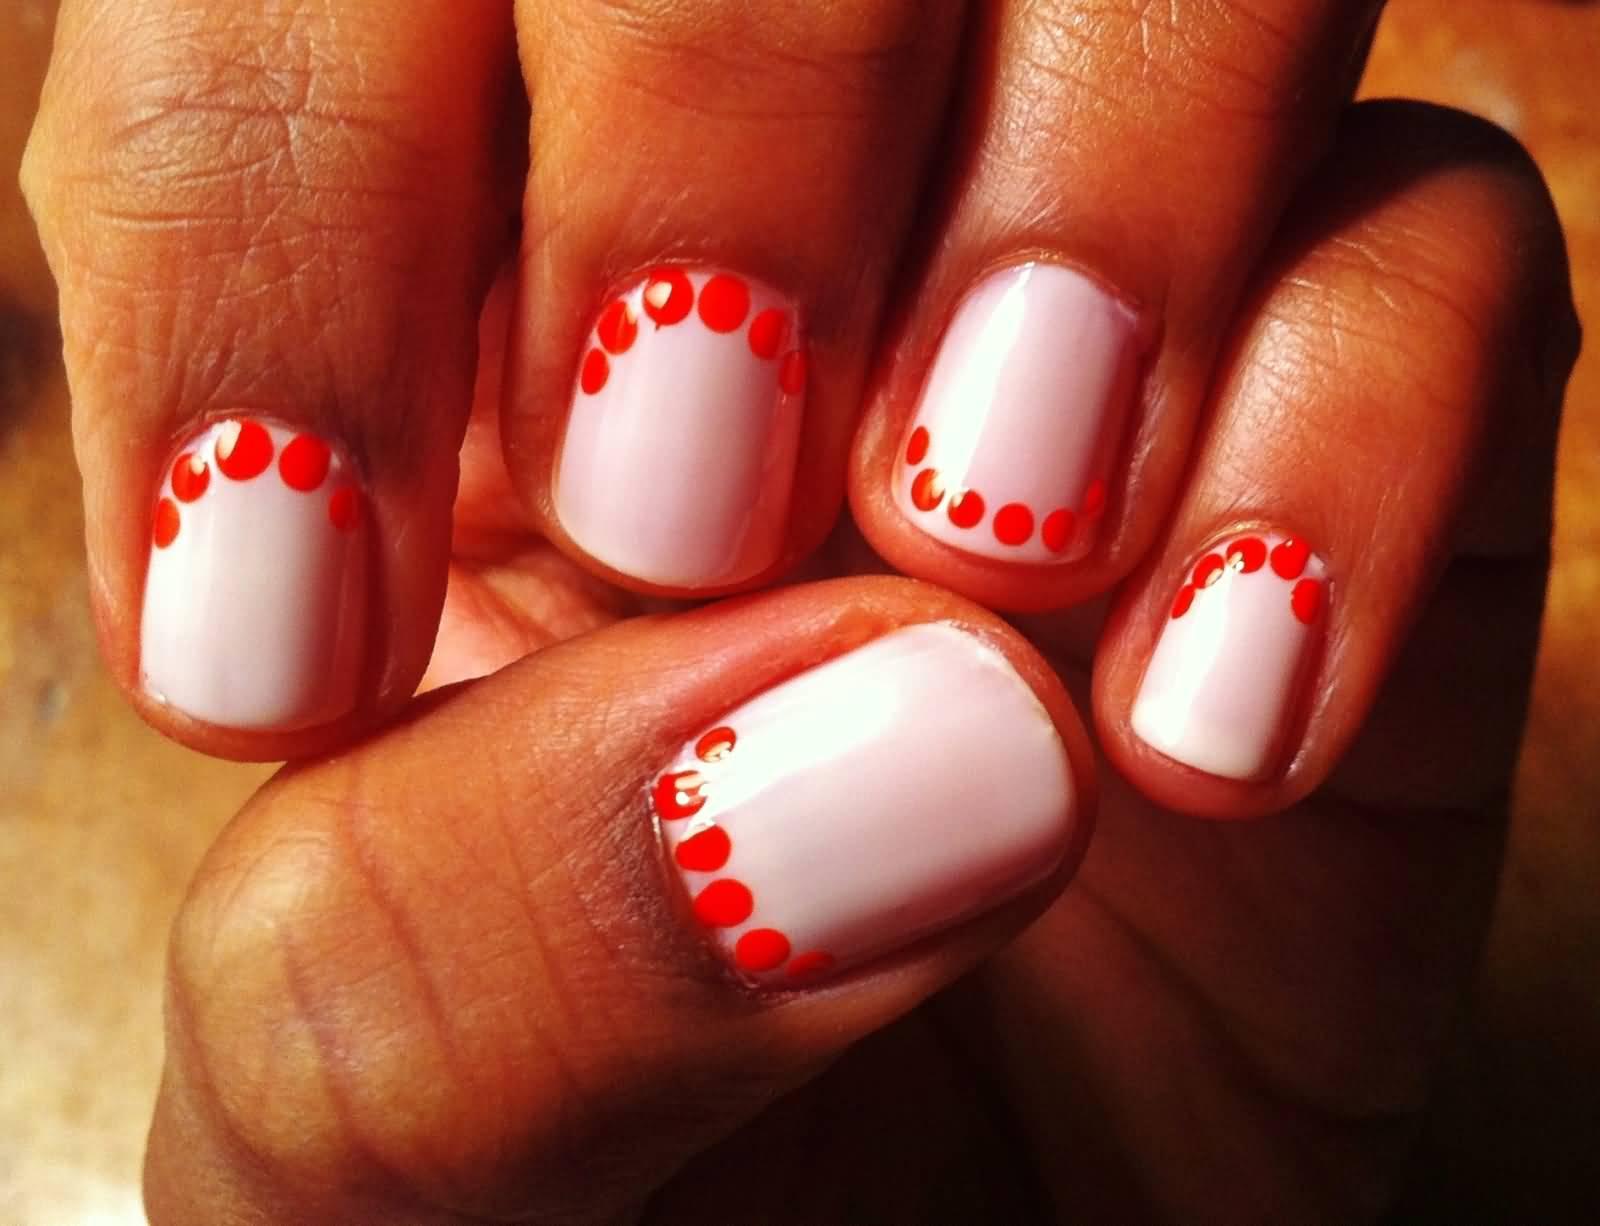 White Nails With Orange Polka Dots Nail Art